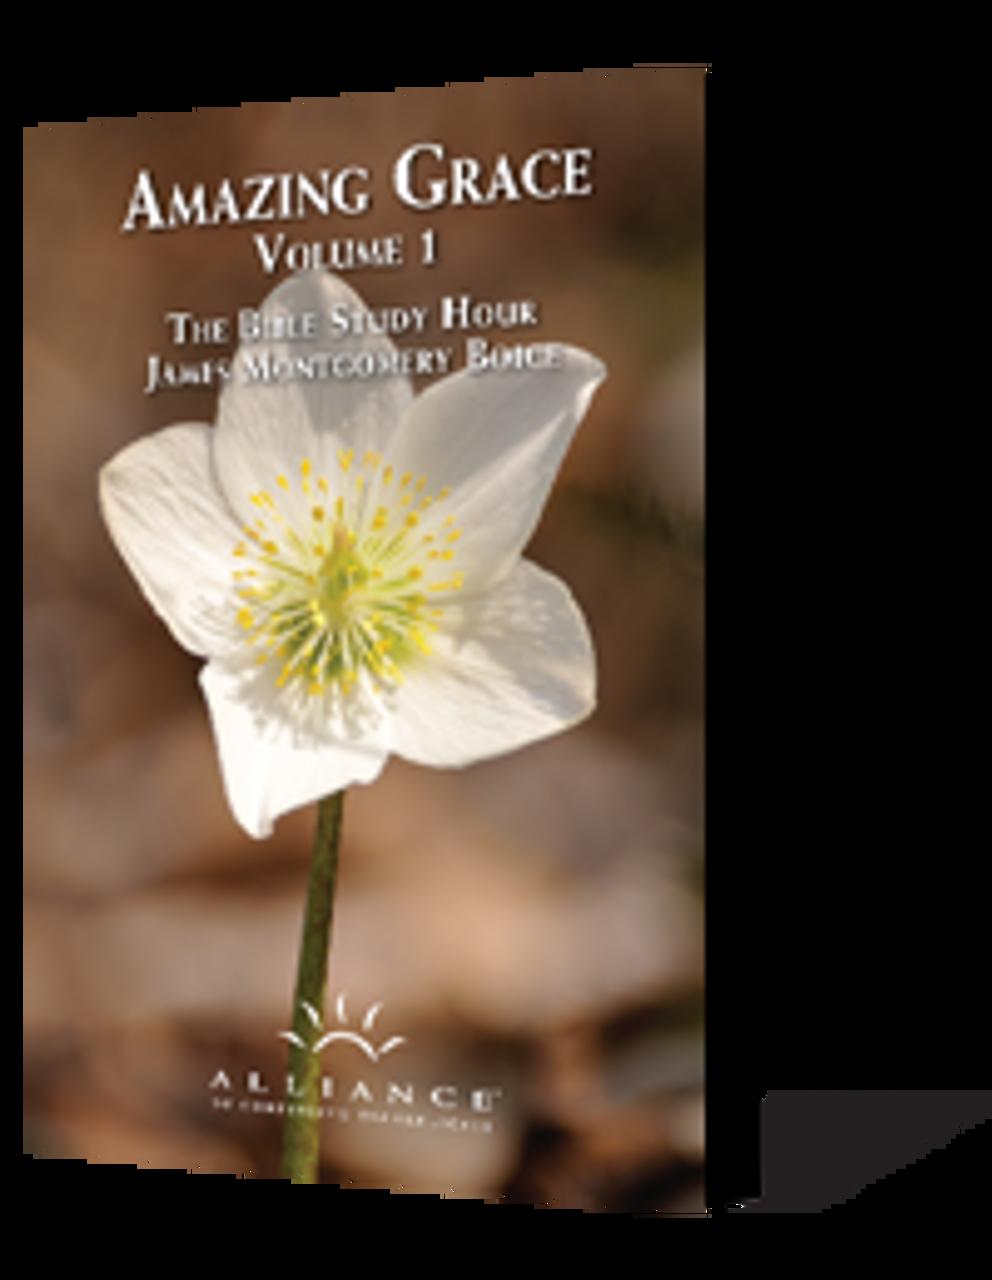 Standing in Grace // Falling From Grace (CD)